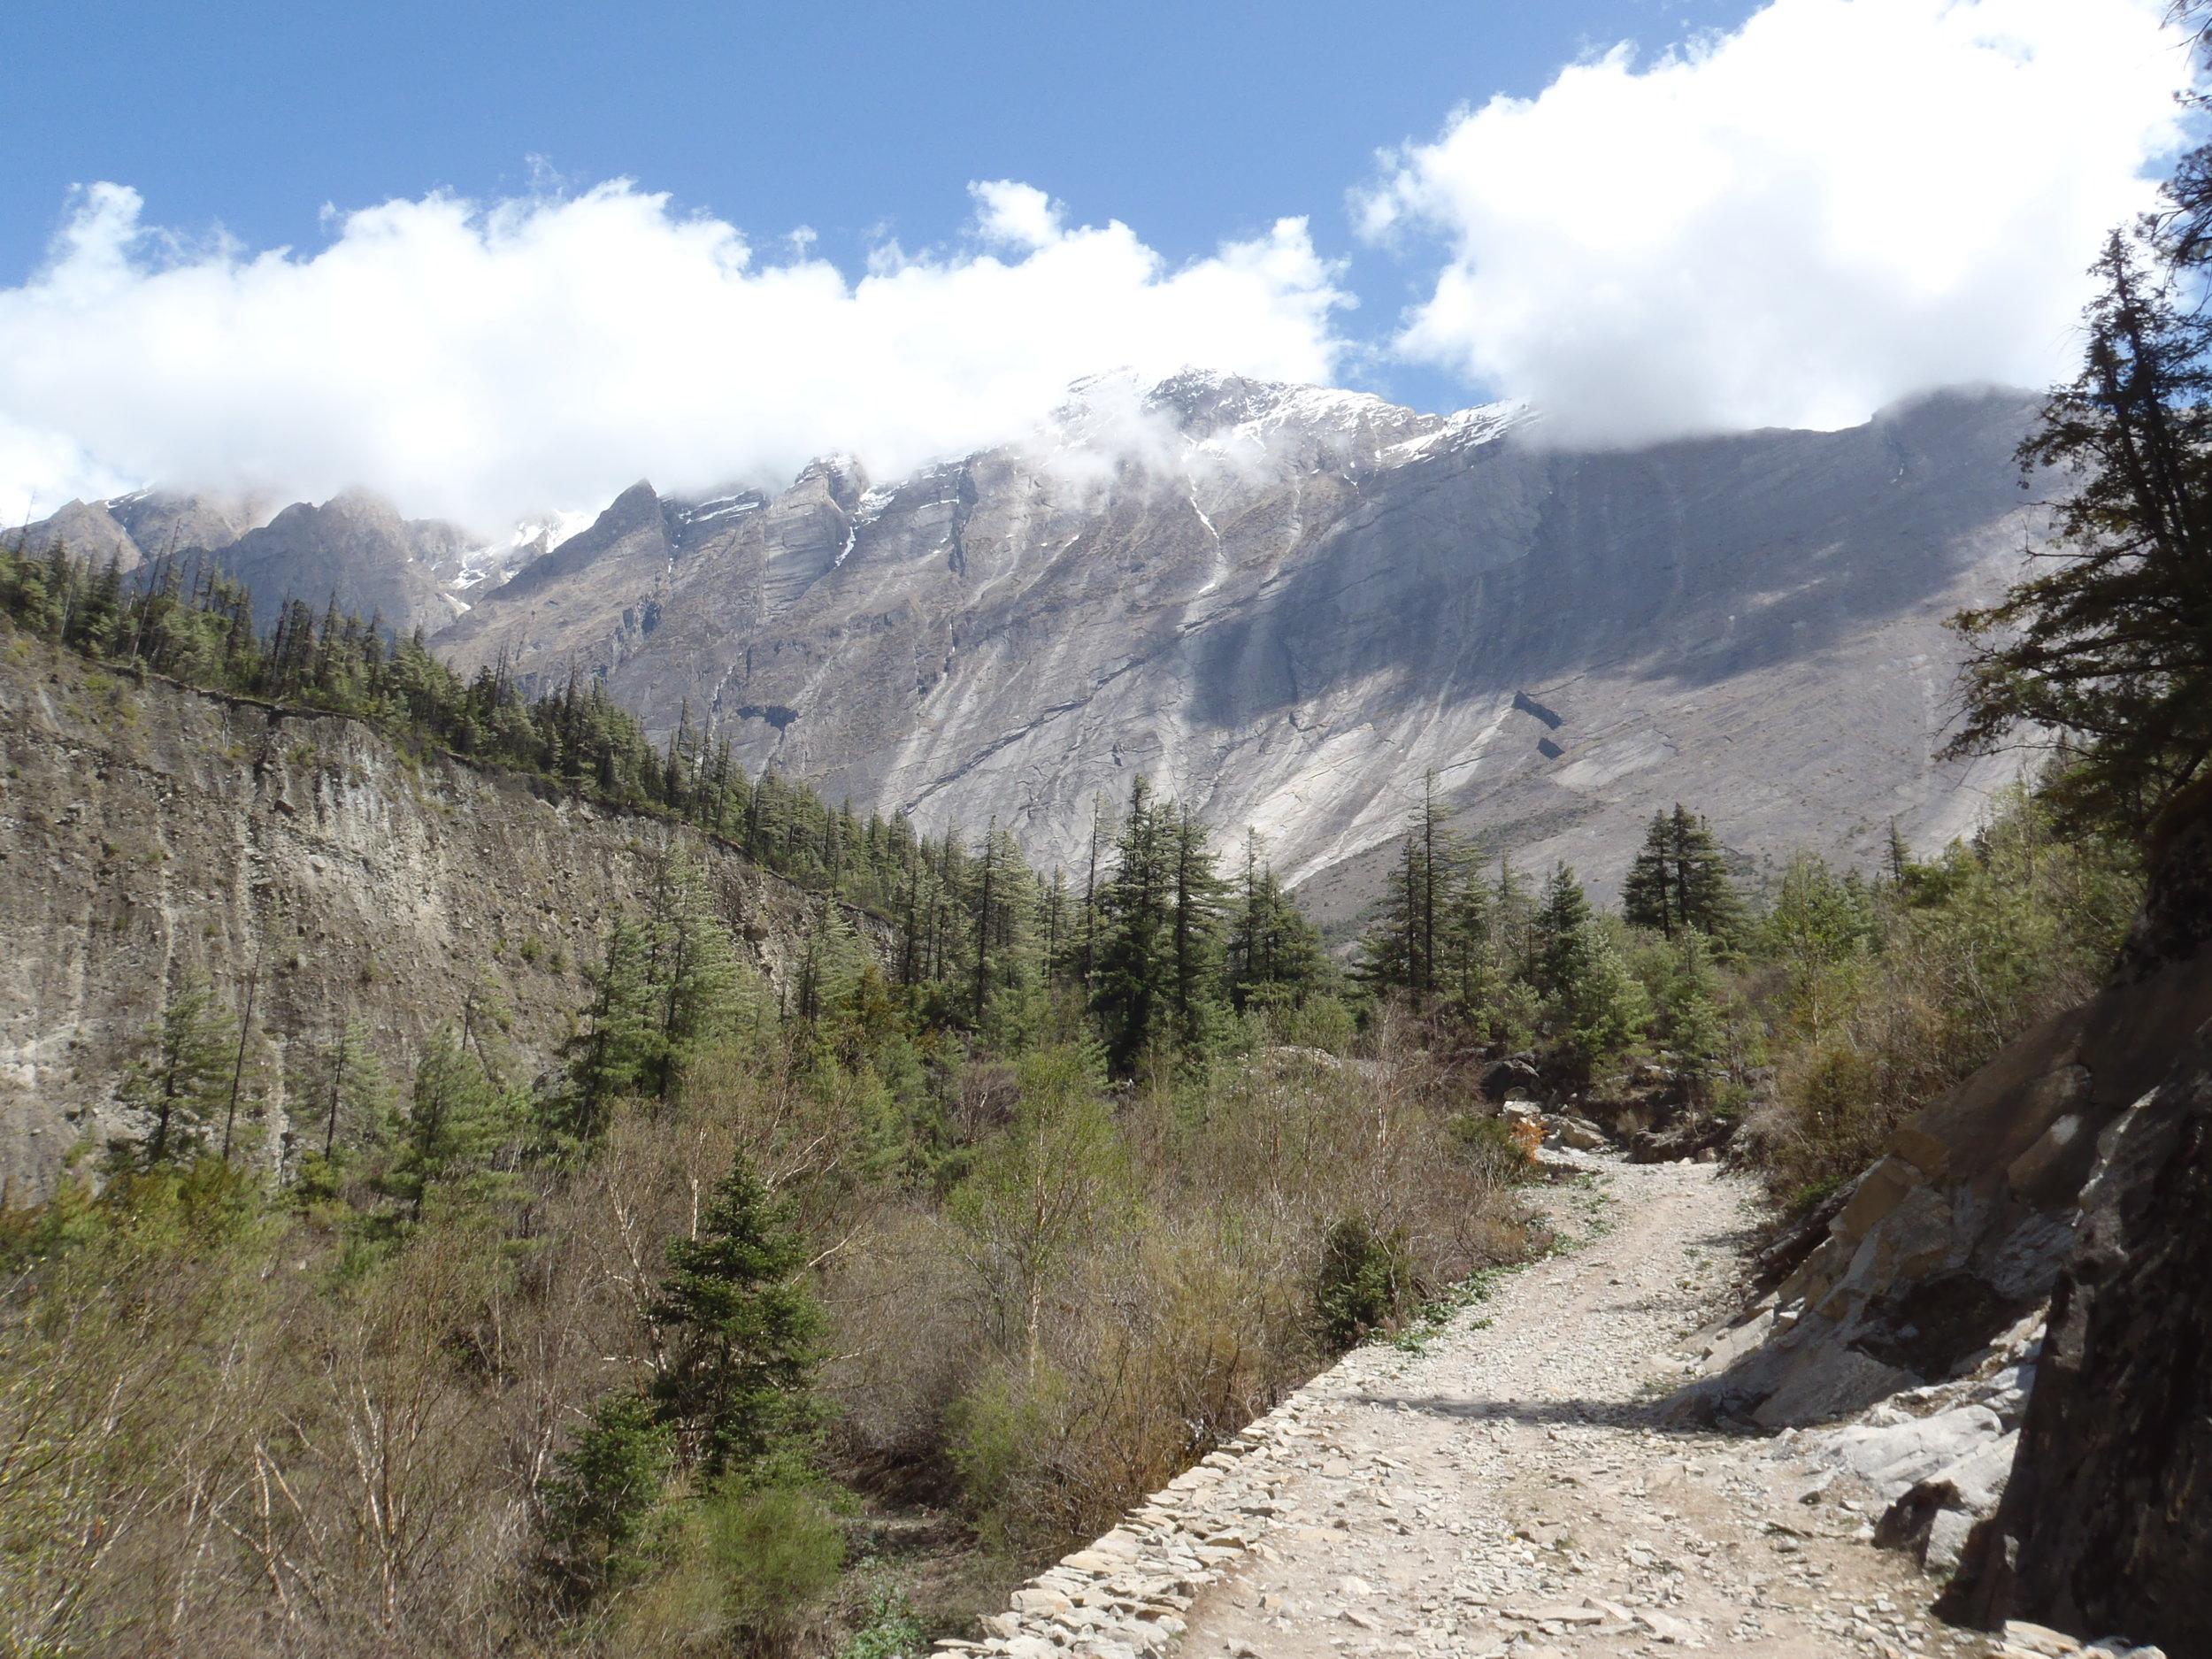 Sub-tropical lends to alpine terrain.